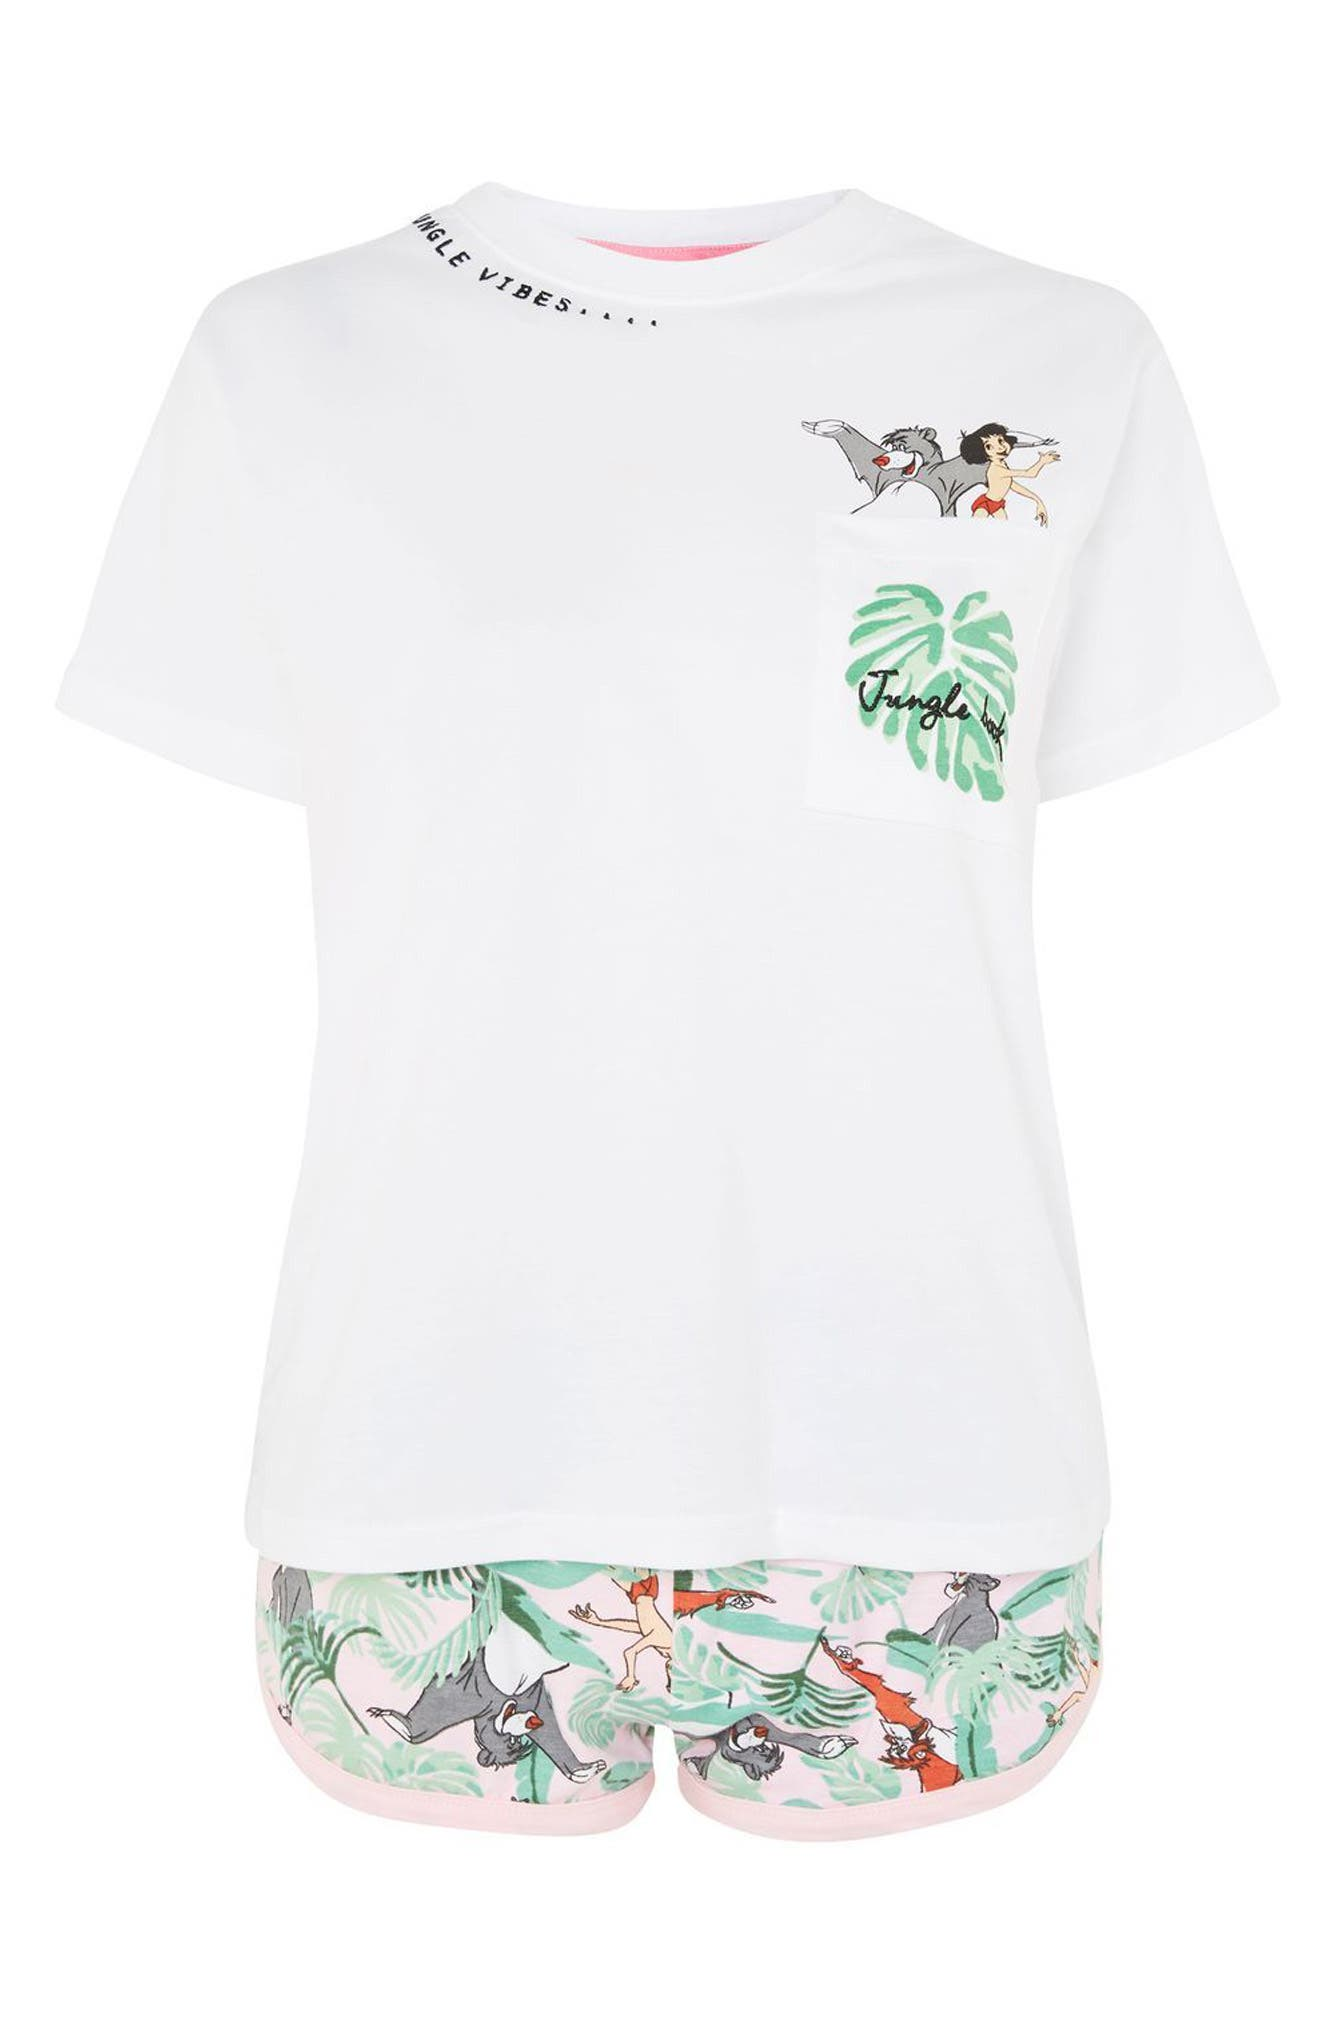 Disney<sup>®</sup> Jungle Book Short Pajamas,                             Alternate thumbnail 3, color,